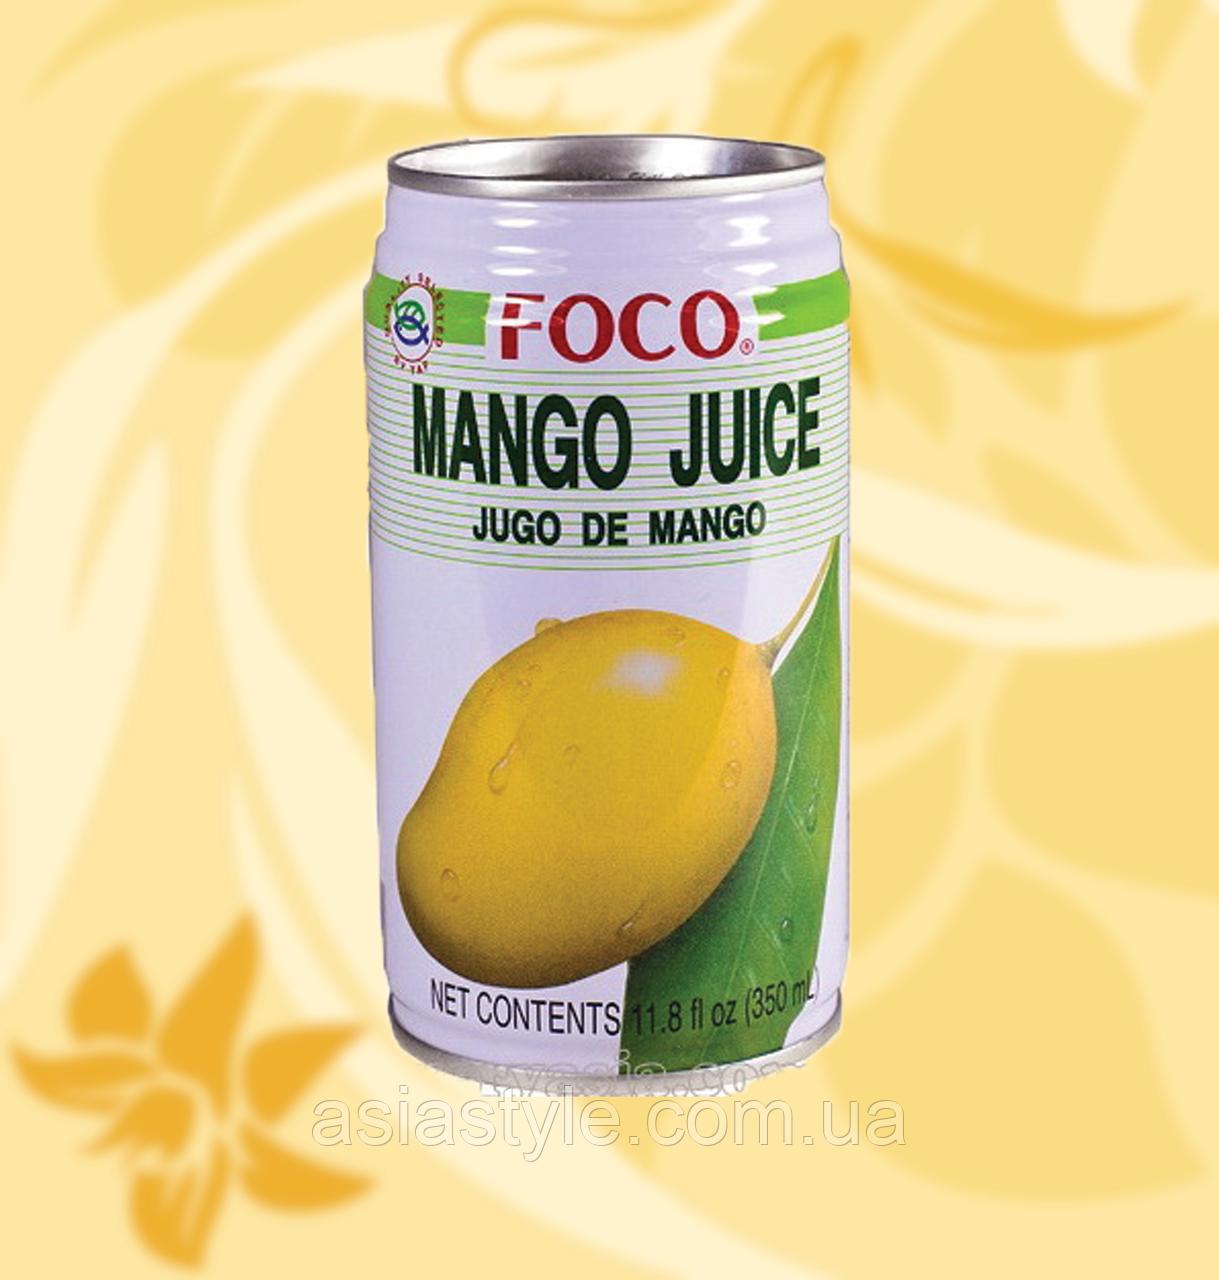 Сік Манго Фоко, Foco, Mango Juice, 350ml, Mo